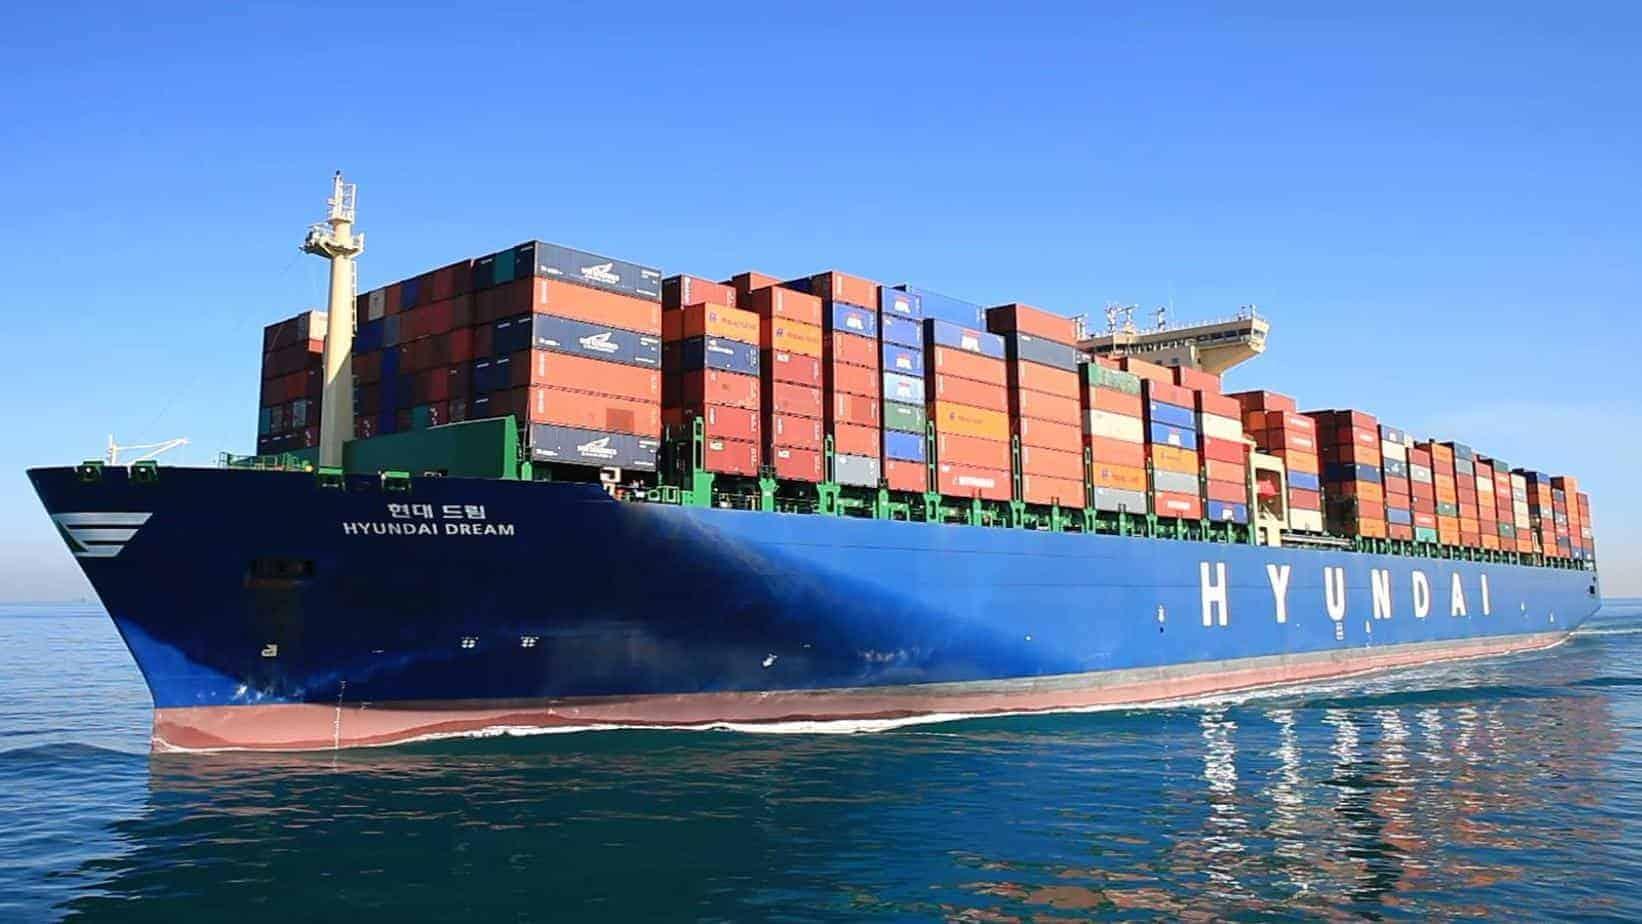 Hyundai Merchant Marine